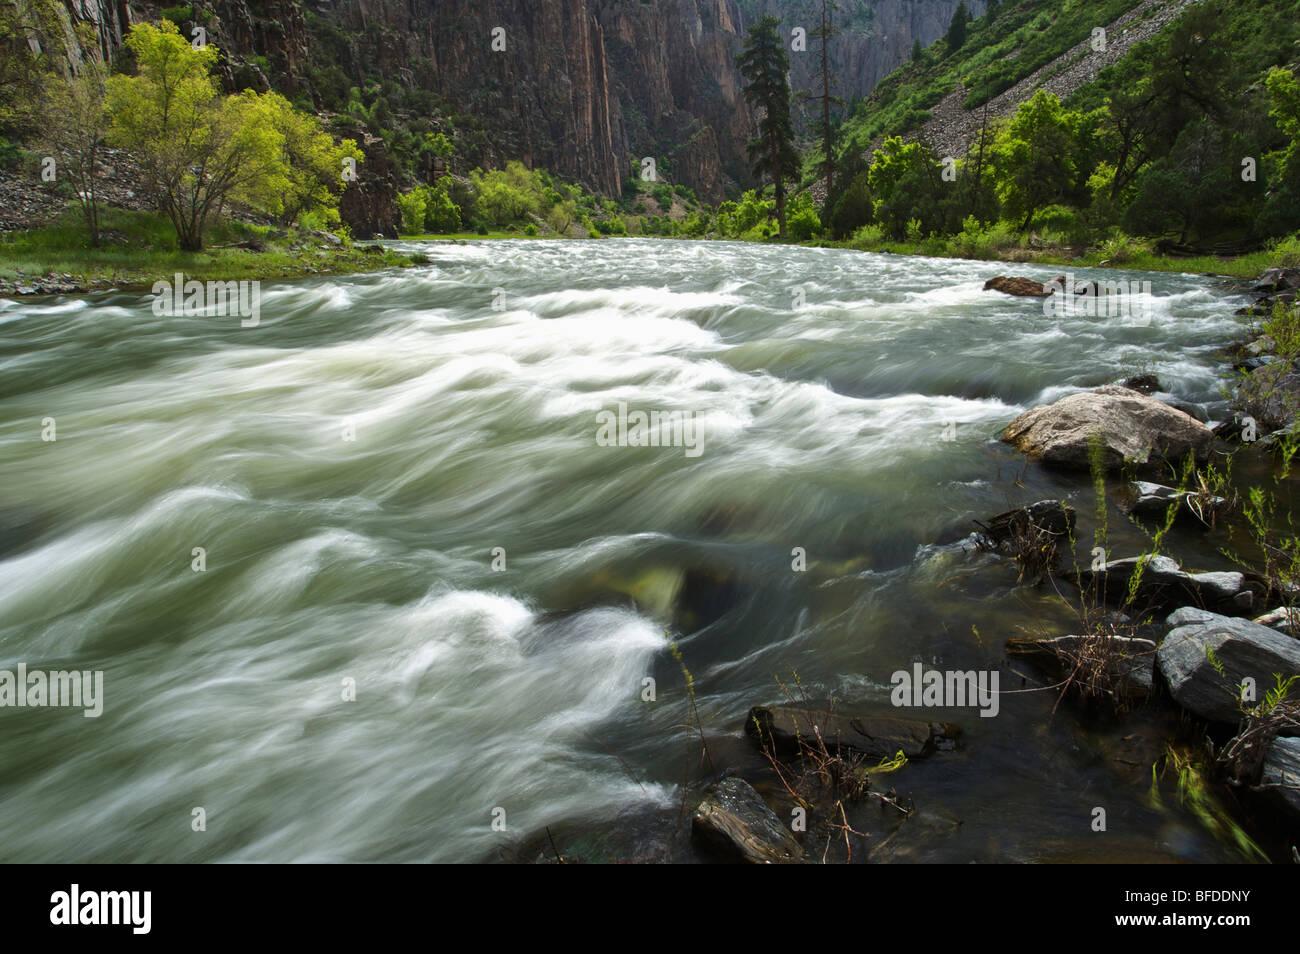 Der Gunnison River im Black Canyon Schlucht, Colorado. (Bewegungsunschärfe) Stockbild